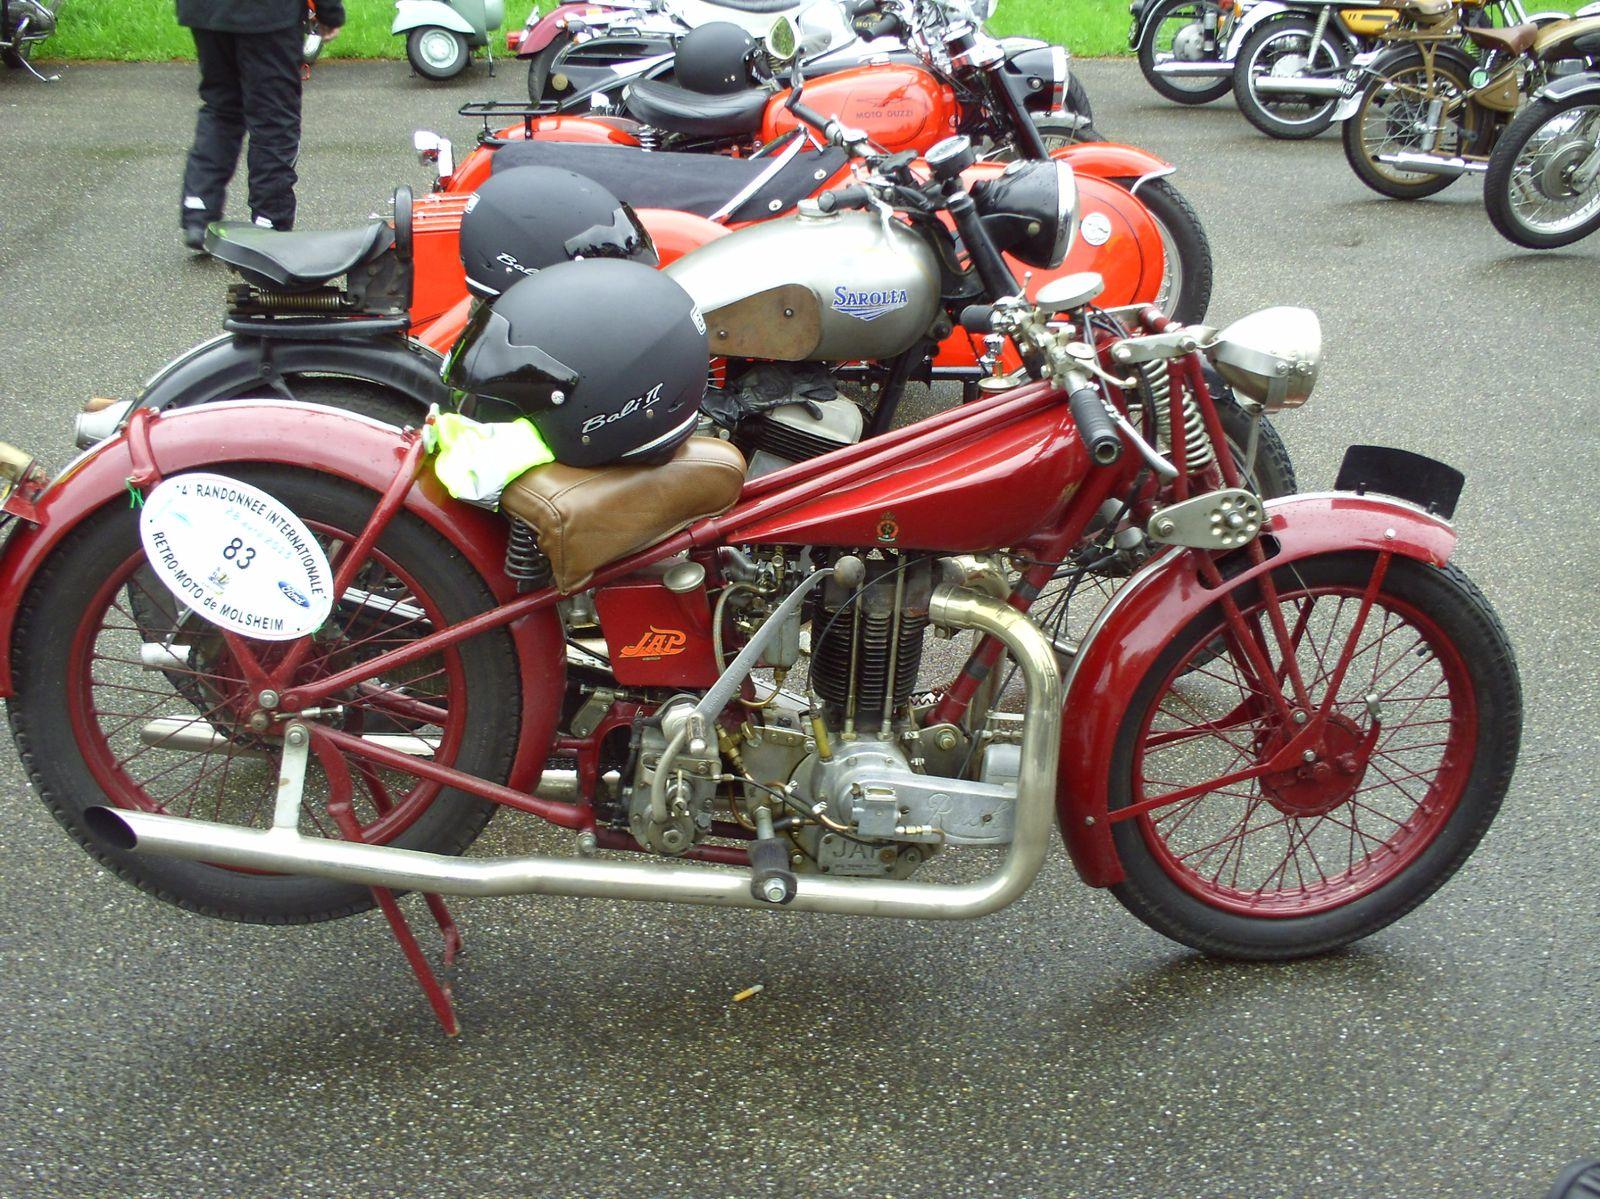 4° Randonnée Internationale Rétro Moto Molsheim - 28/04/2013